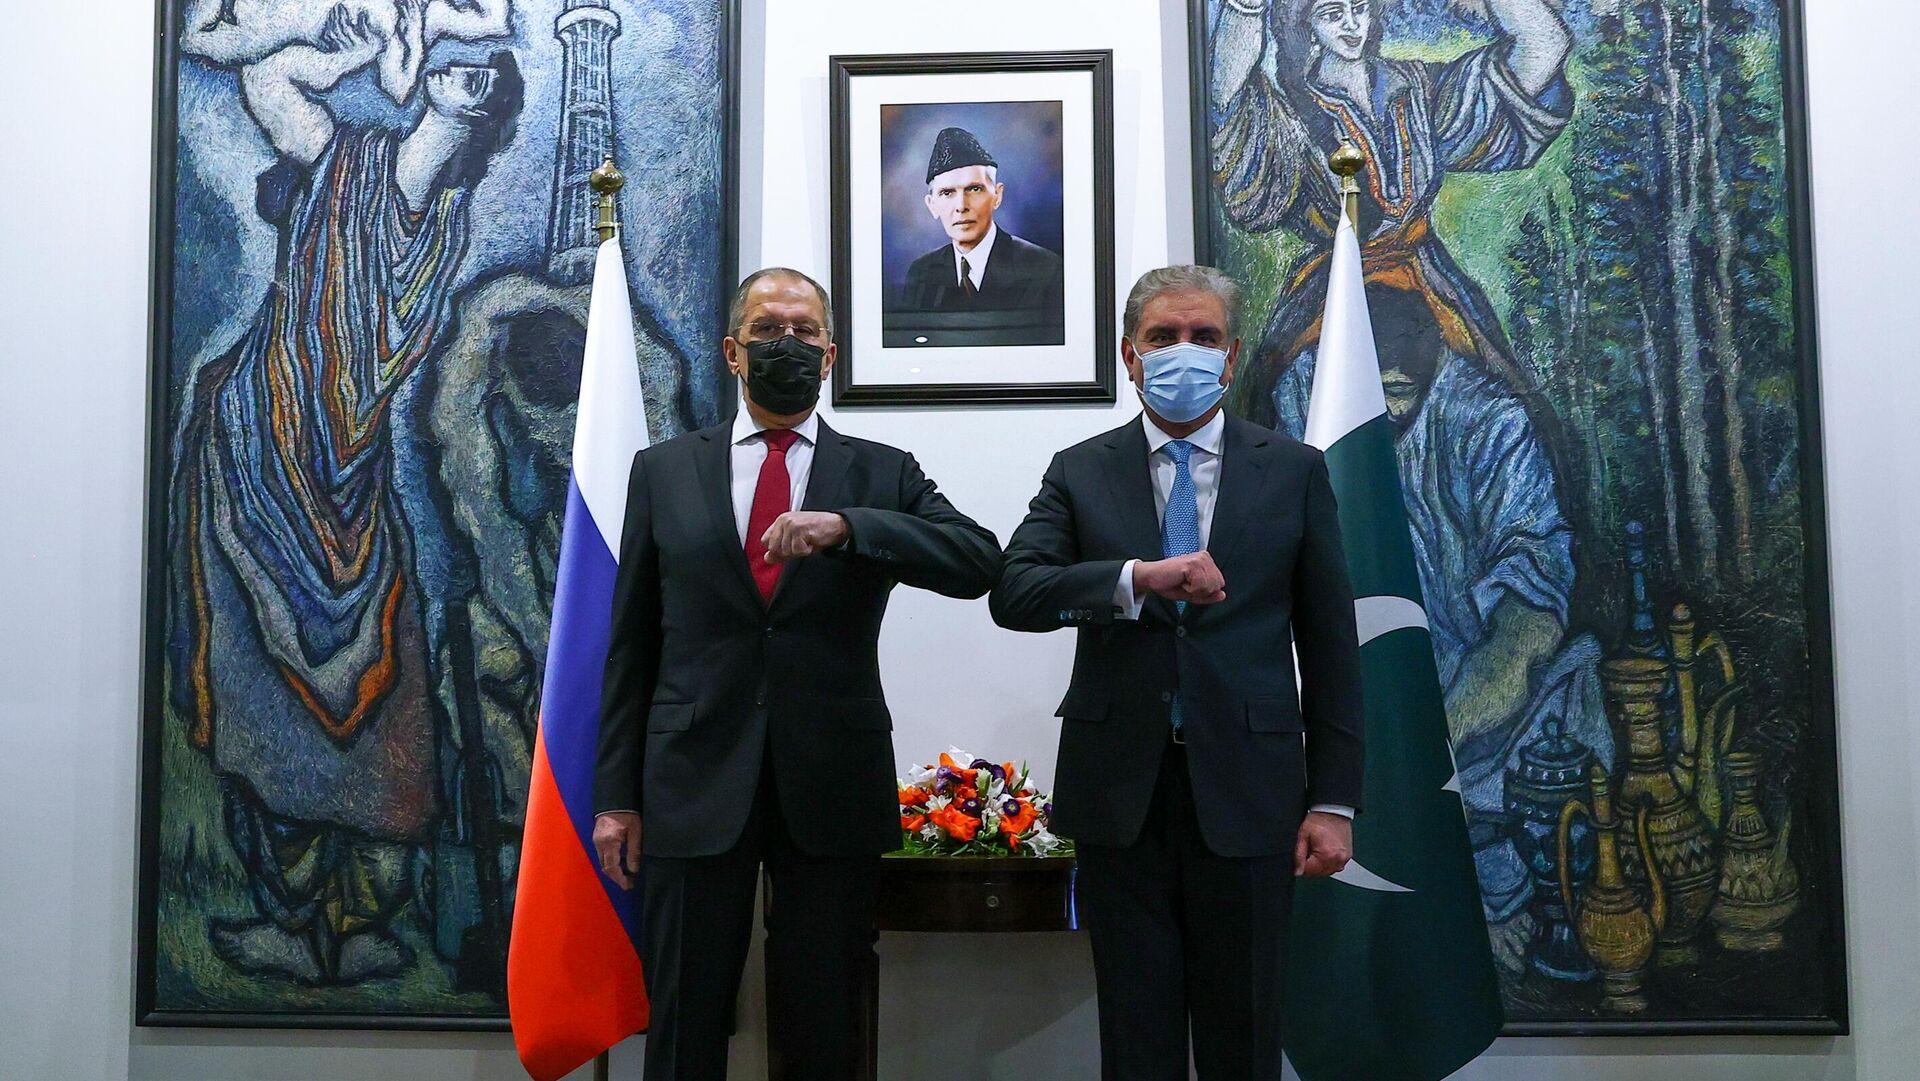 Canciller ruso, Serguéi Lavrov, y ministro de Exteriores de Pakistán, Shah Mahmoud Qureshi - Sputnik Mundo, 1920, 08.04.2021